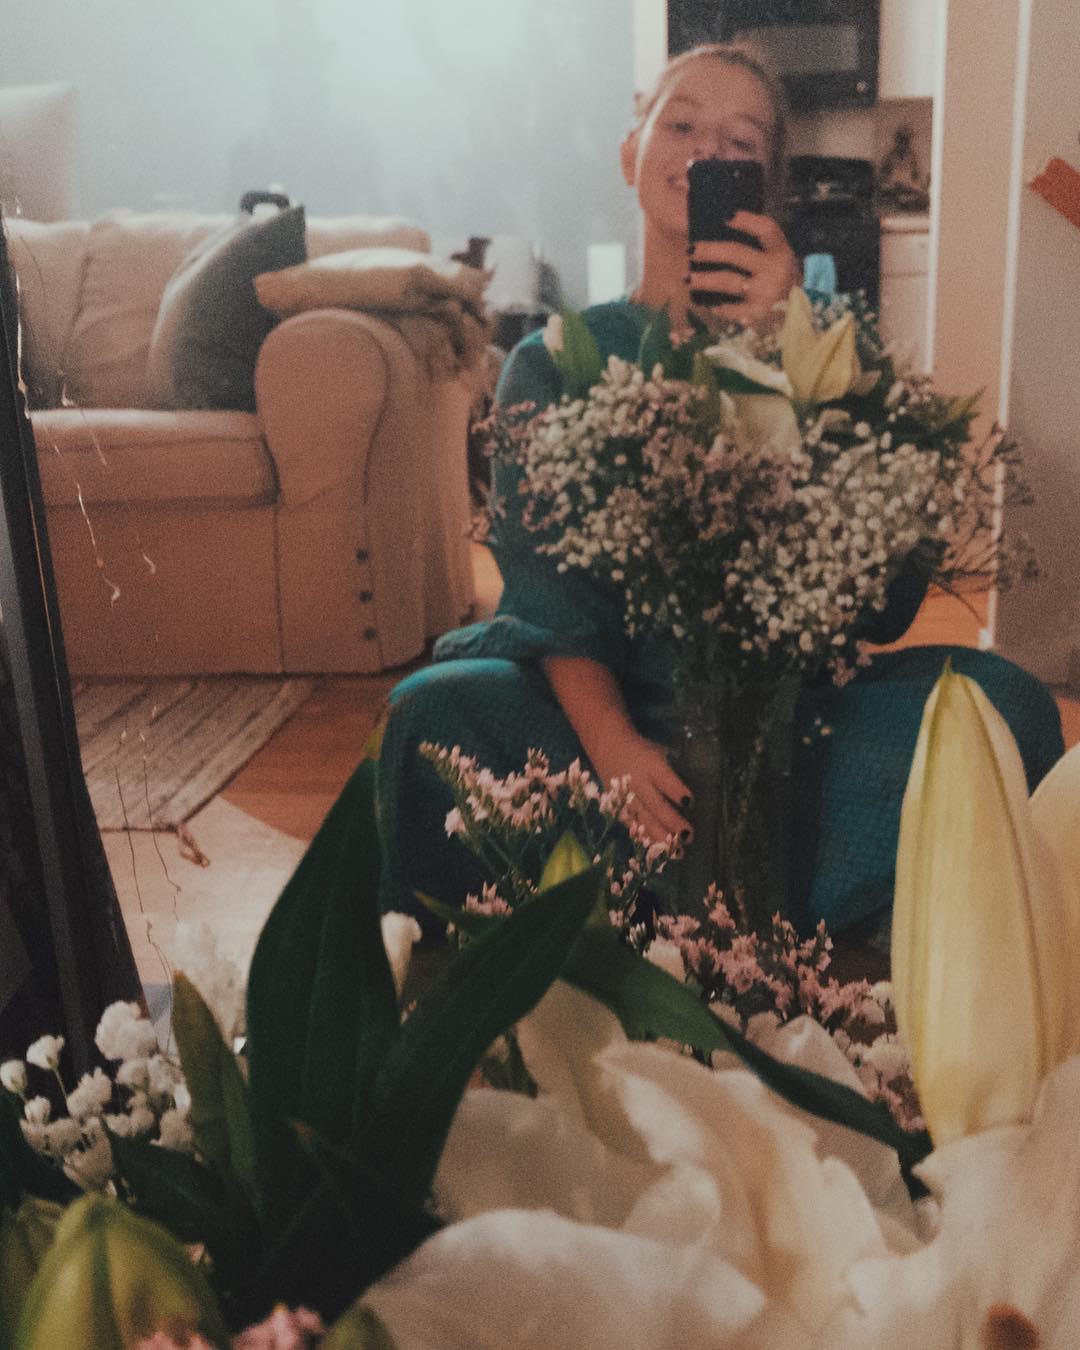 СМИ: телеведущая Екатерина Стриженова скоро станет бабушкой